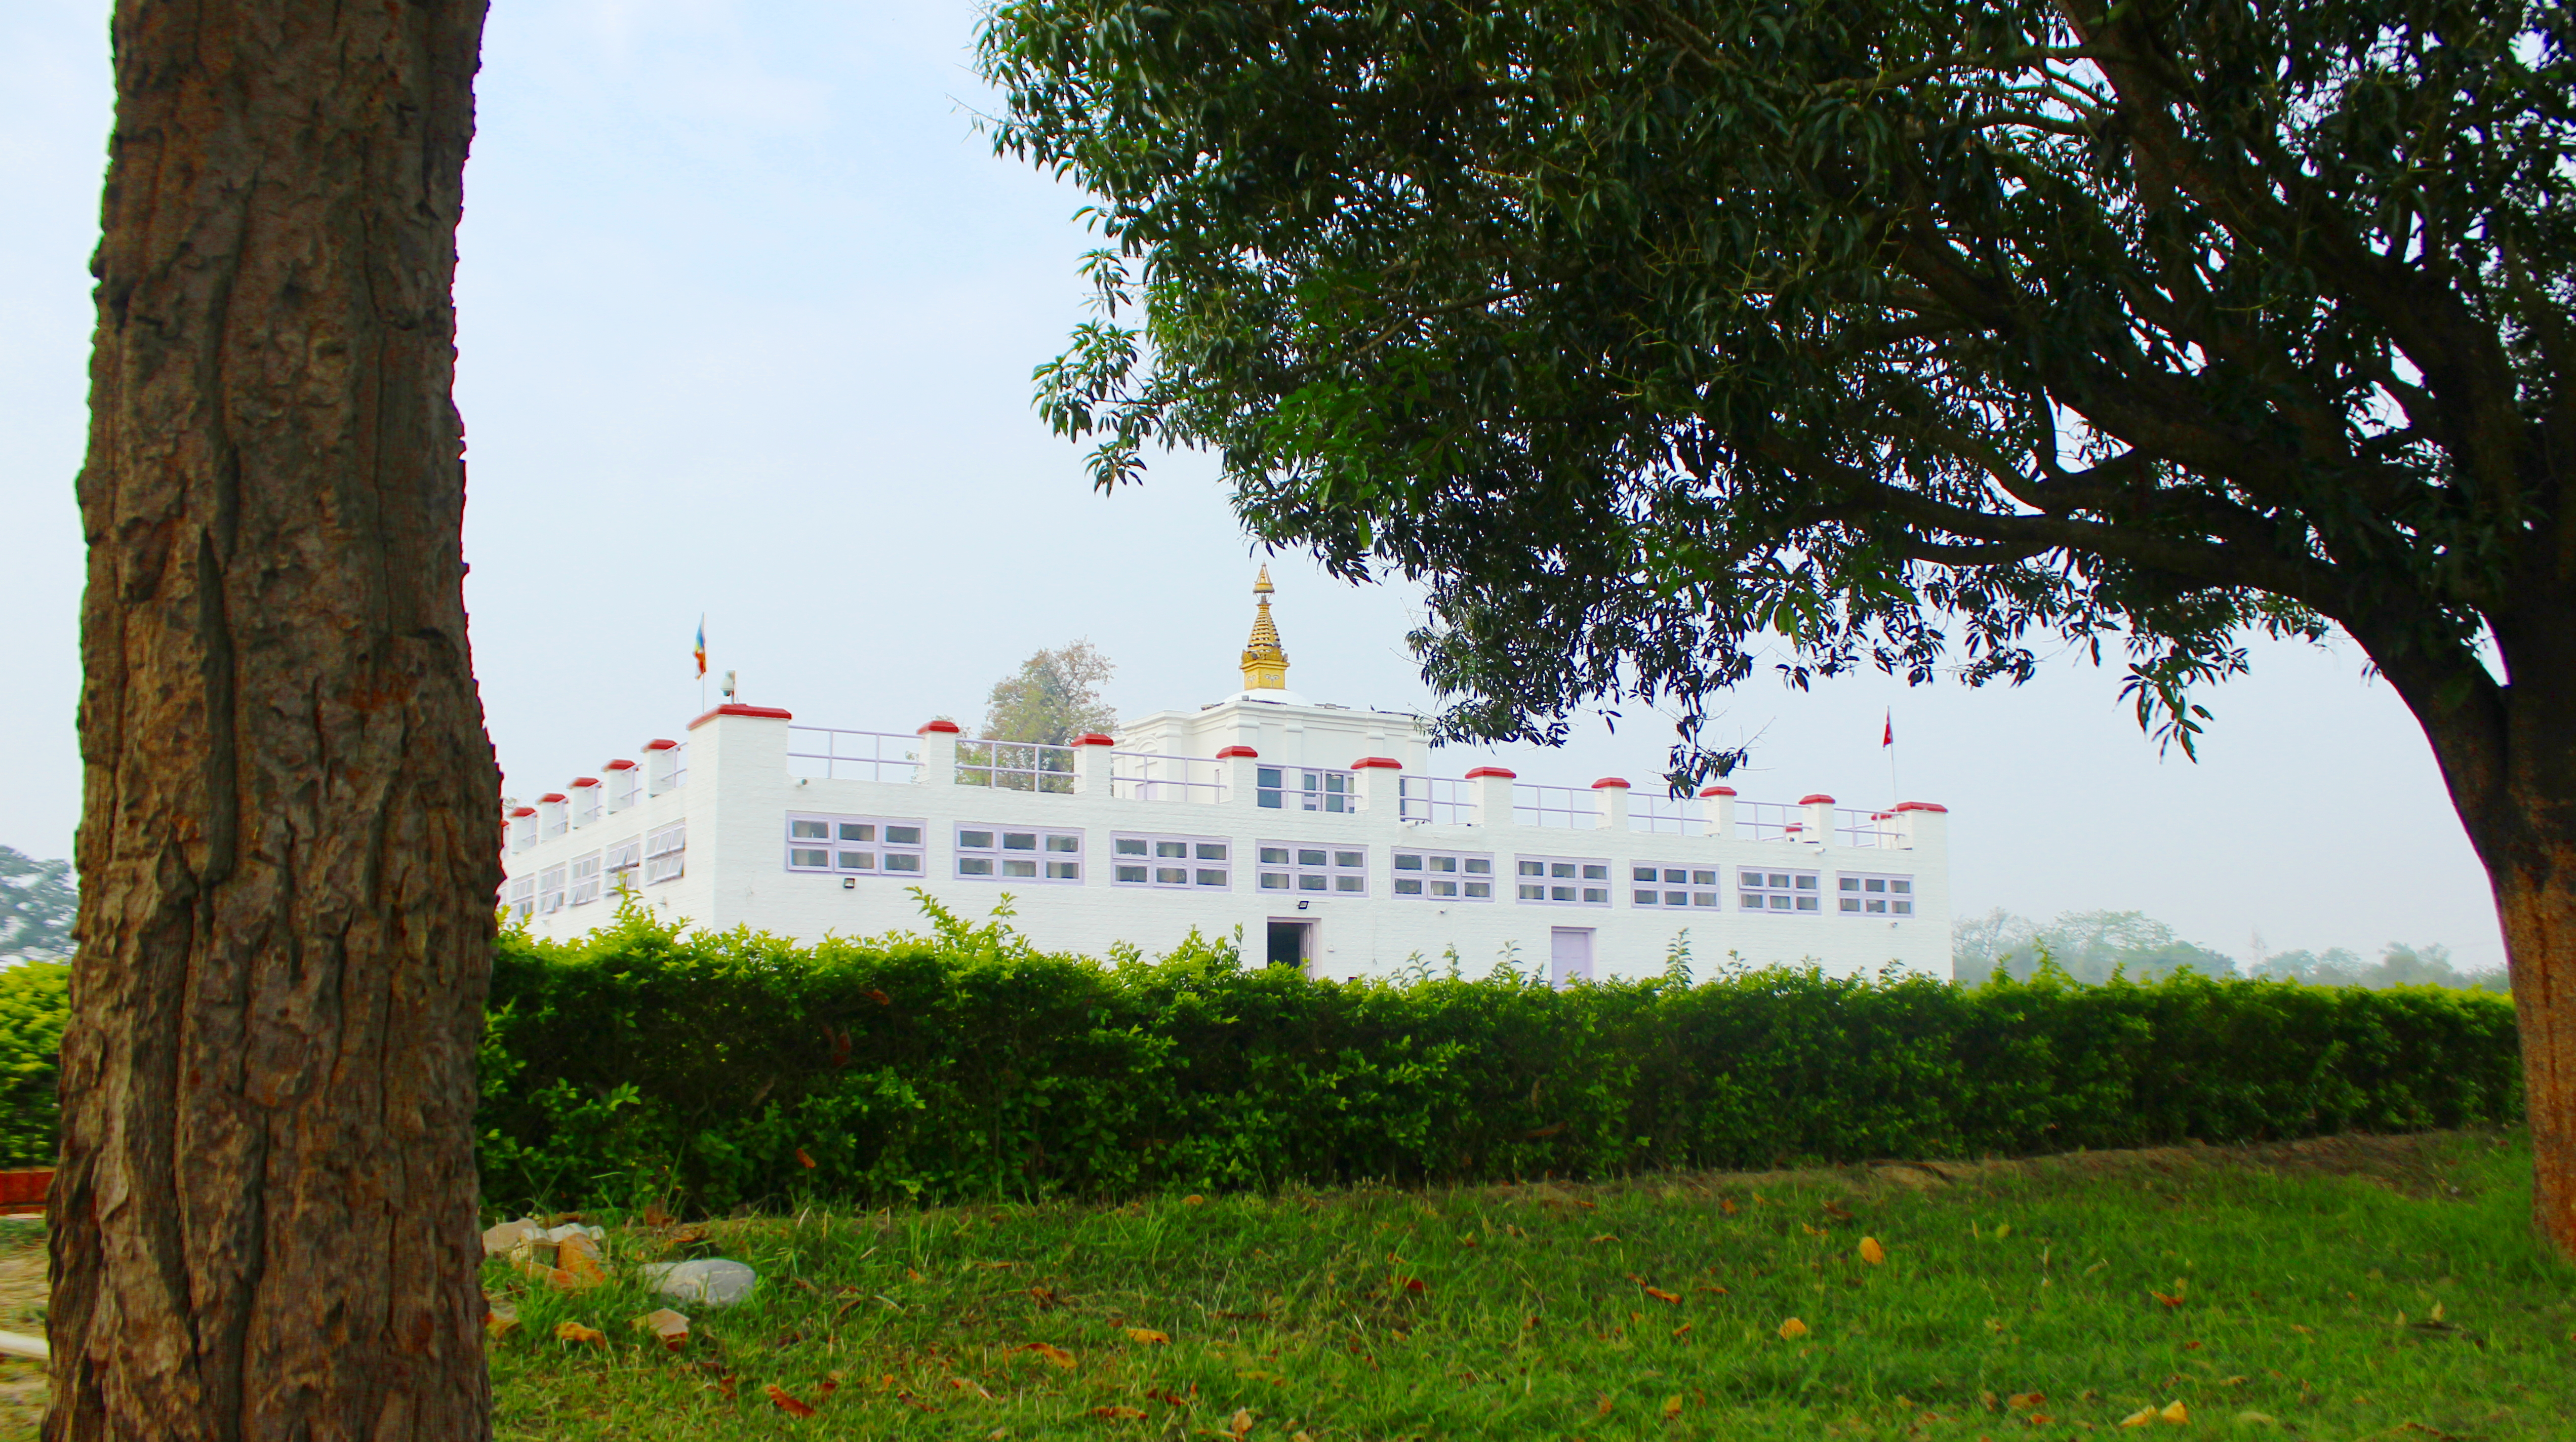 Mayadevi Temple Lumbini front view.jpg